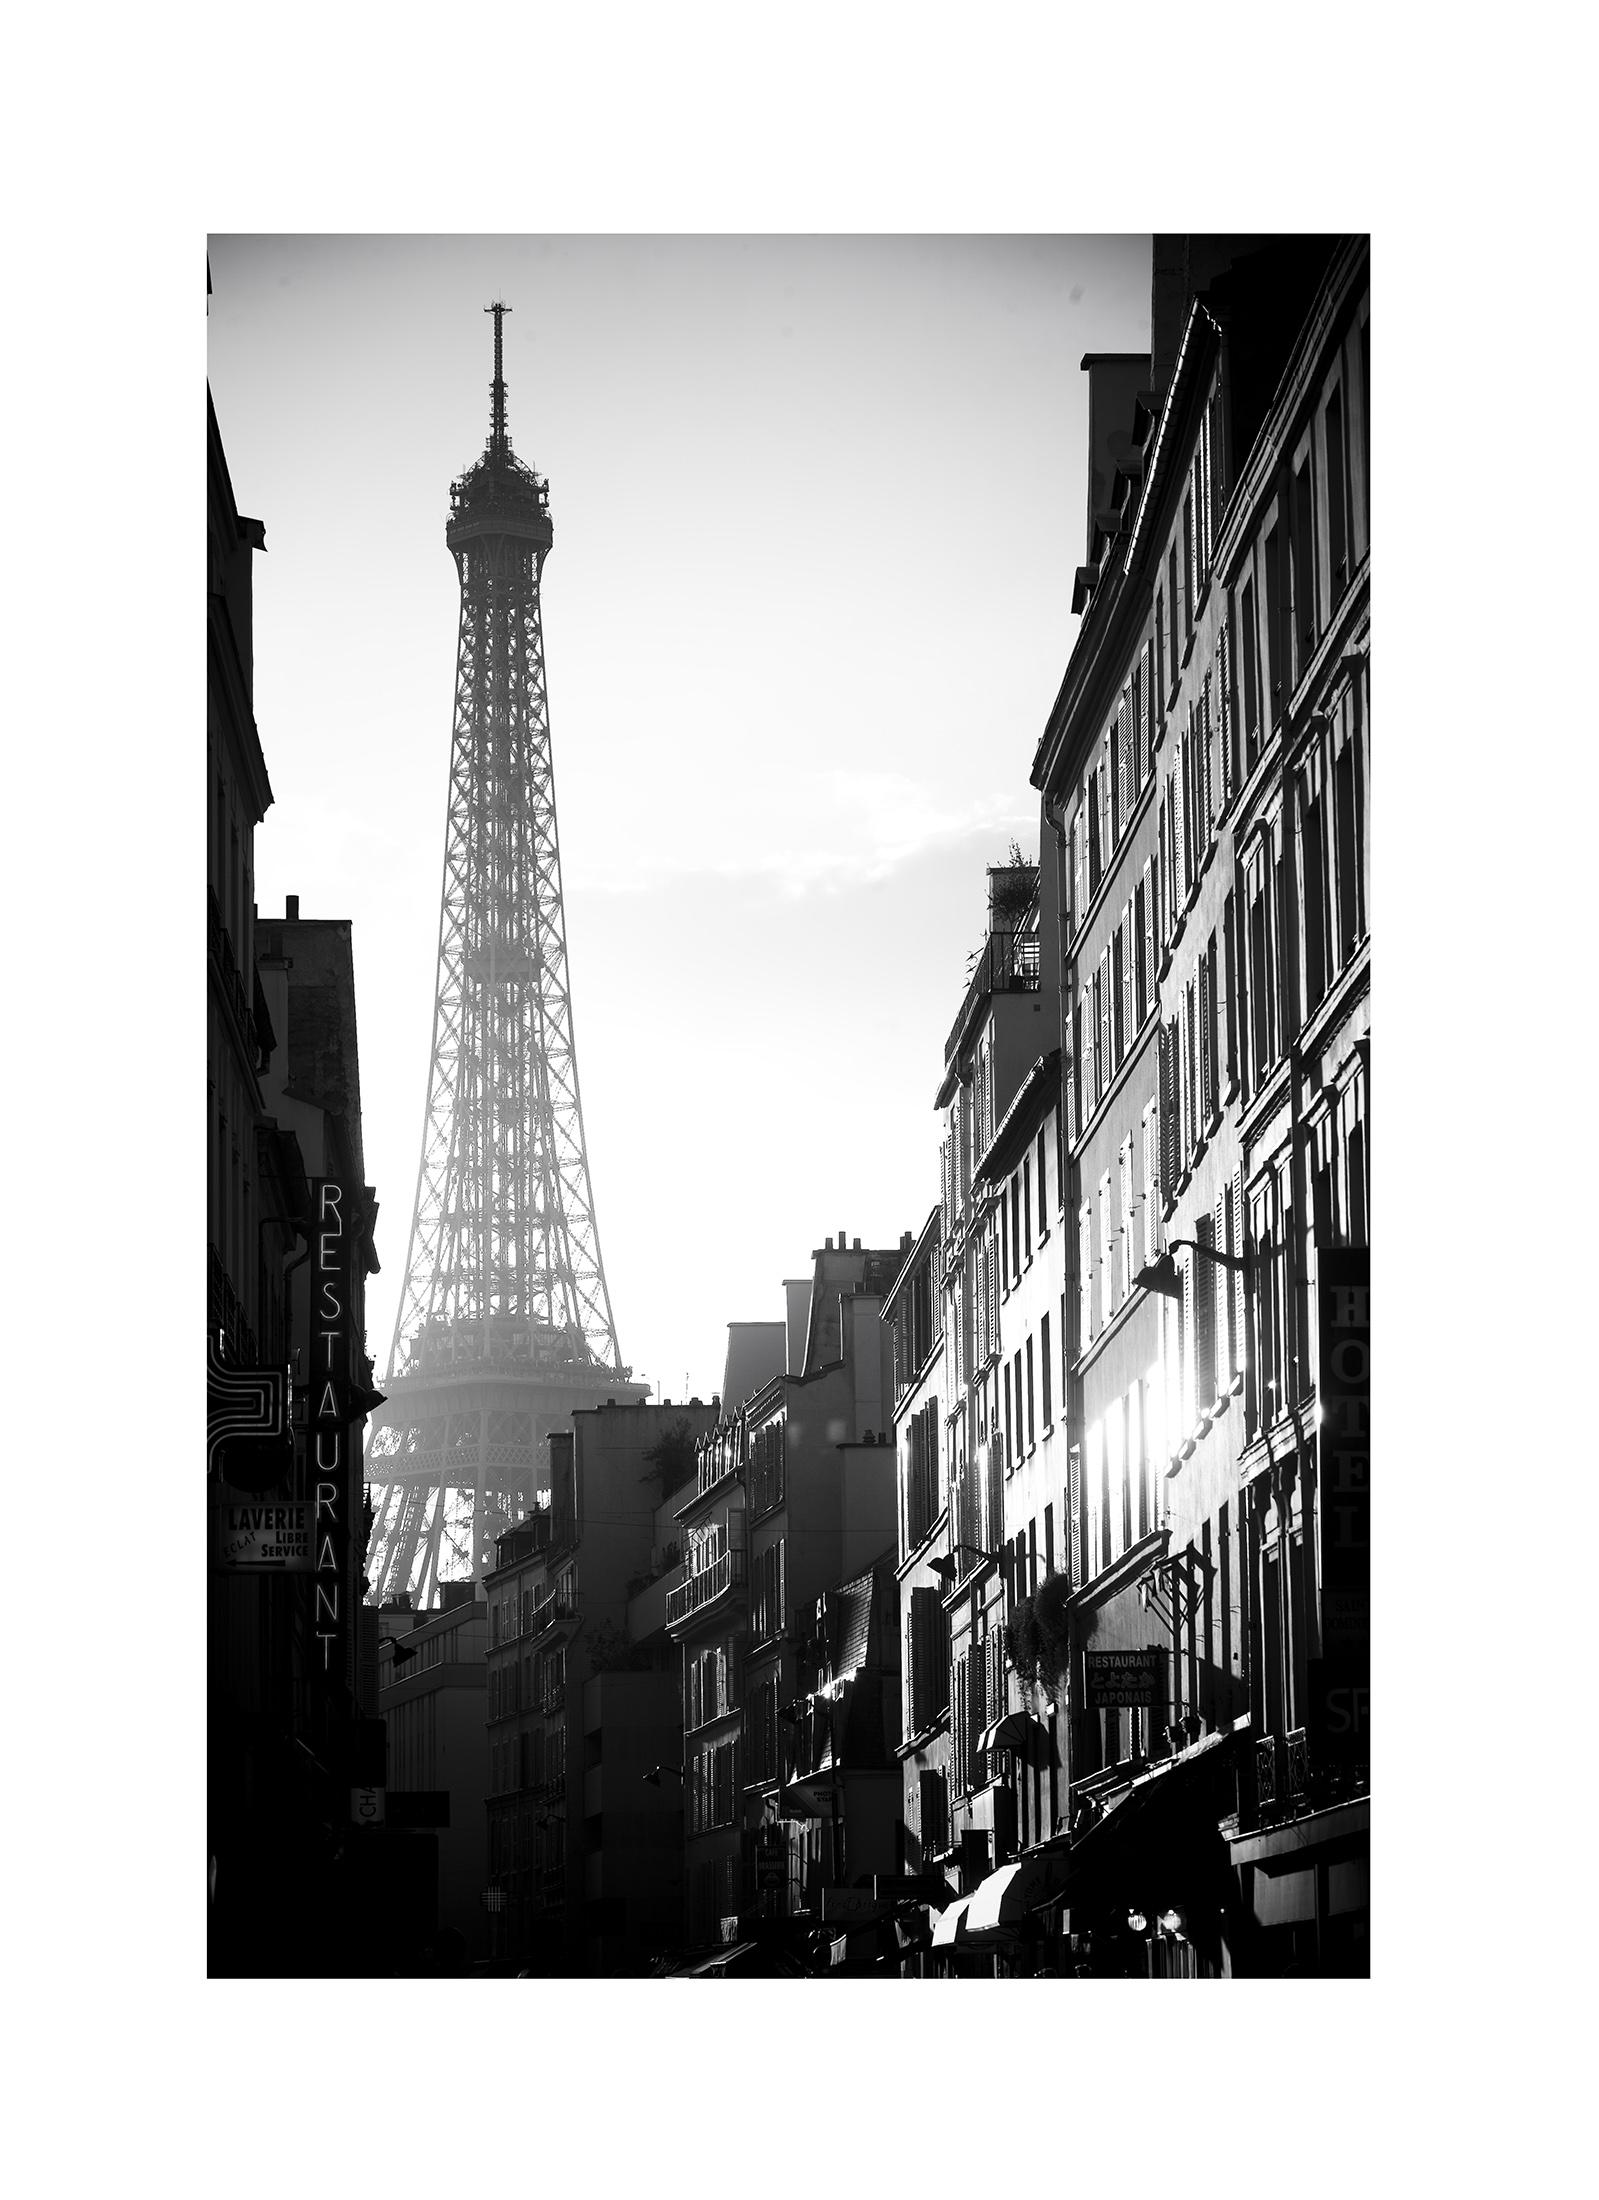 Paris_MG_9902.jpg